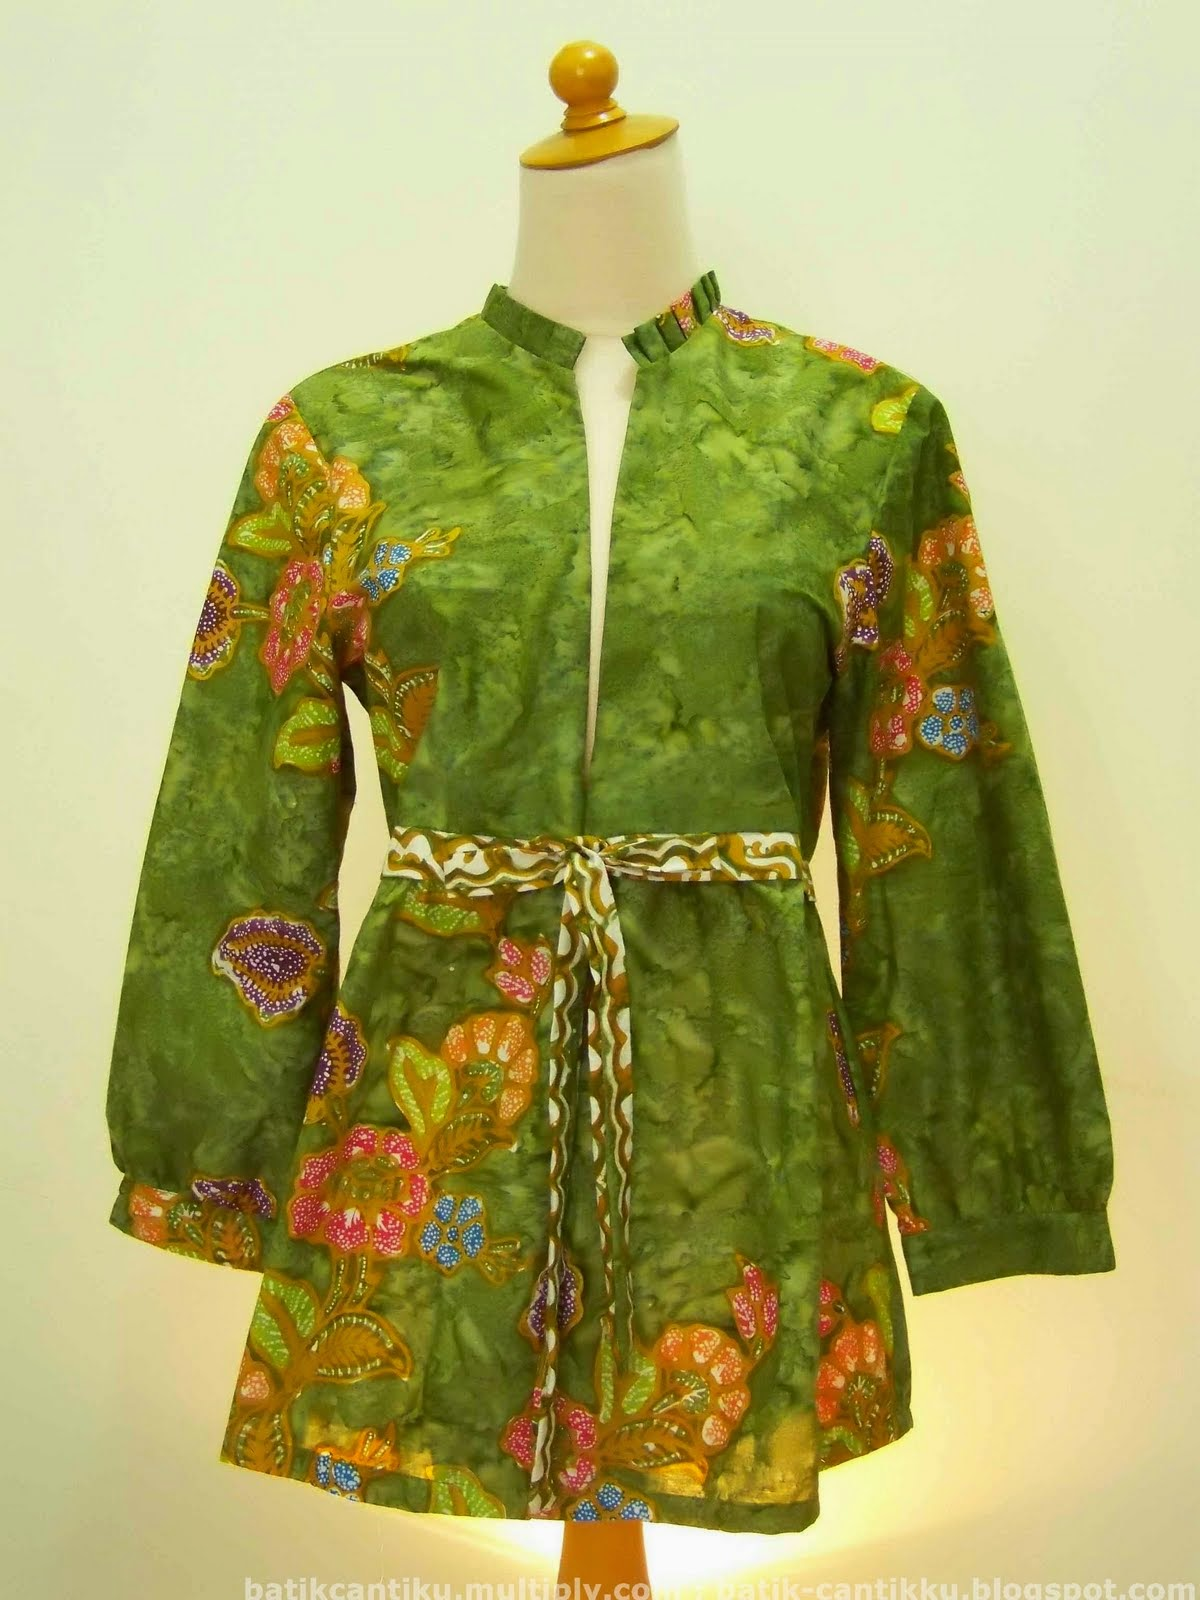 Contoh Model Baju Batik Hamil Untuk Kerja